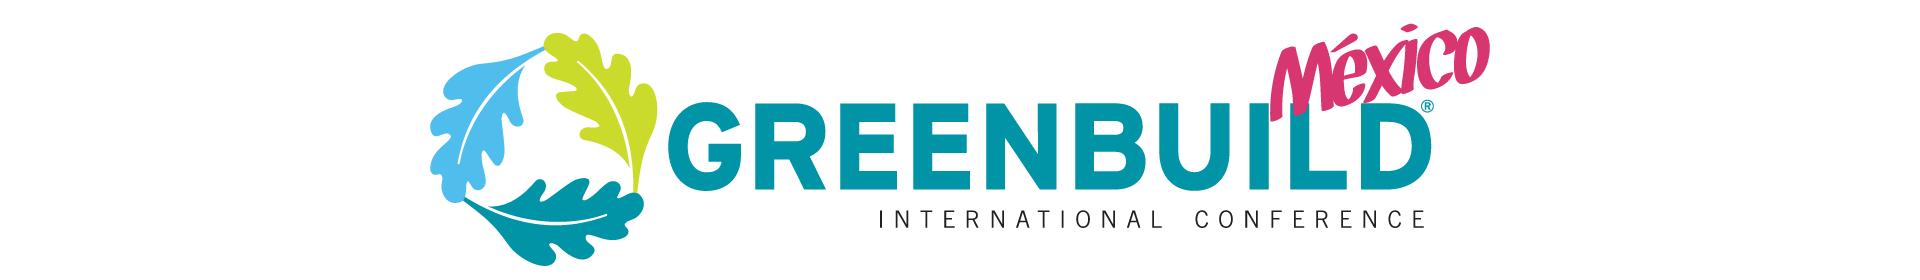 Greenbuild Mexico 2020 Event Banner